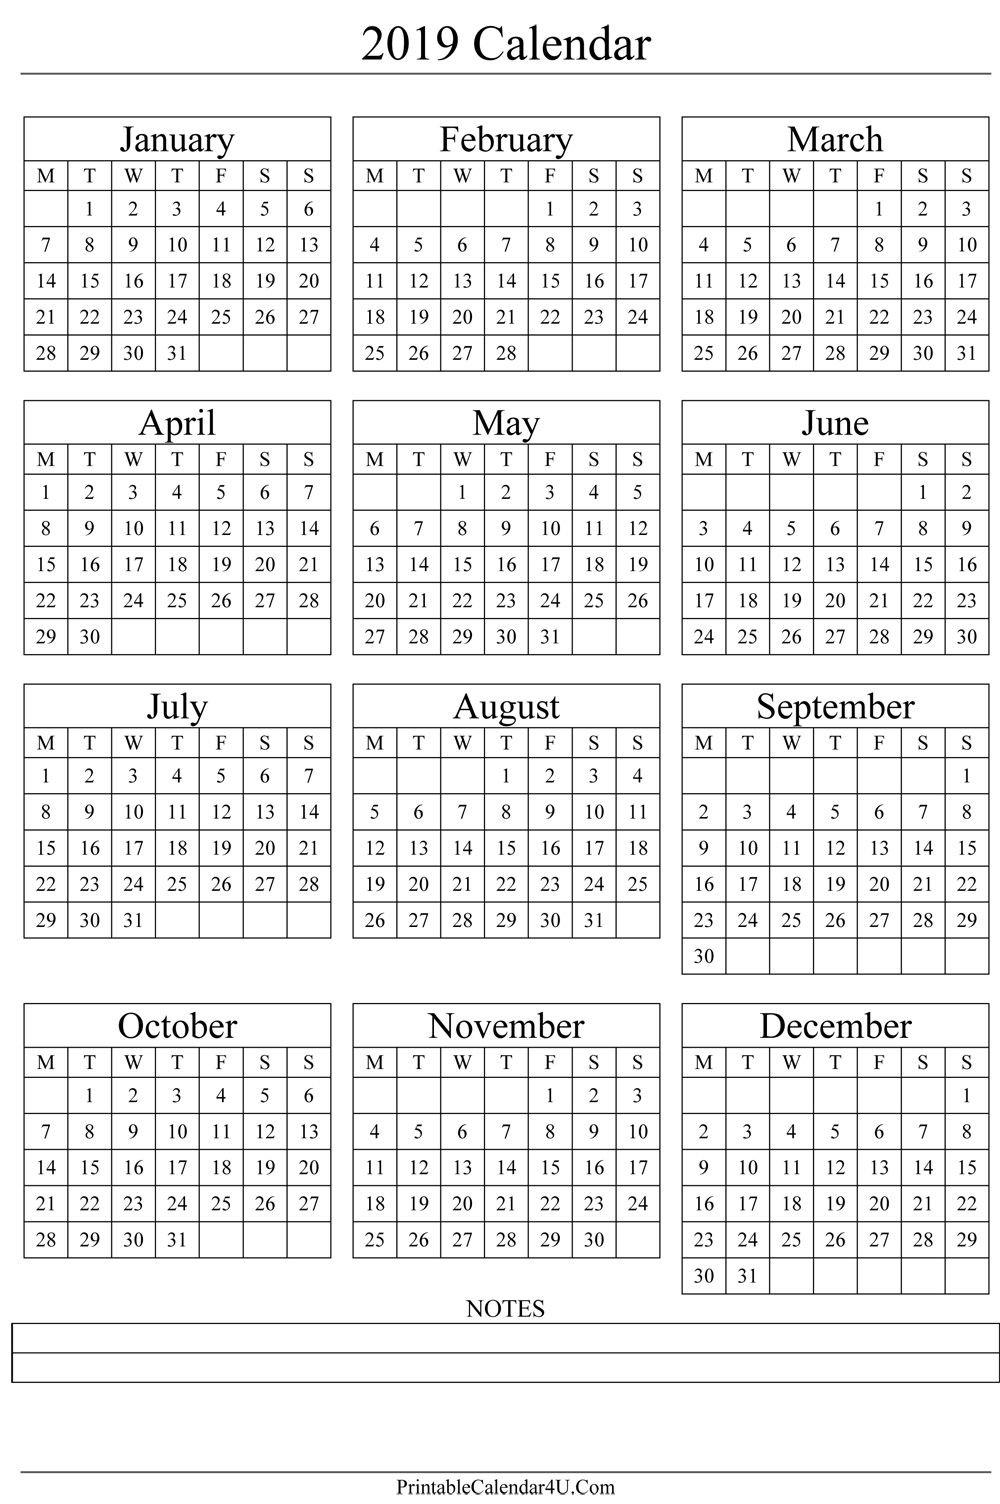 Annual Calendar 2019 Portrait Printable Calendar 2017 | Gift Ideas Calendar 2019 Portrait